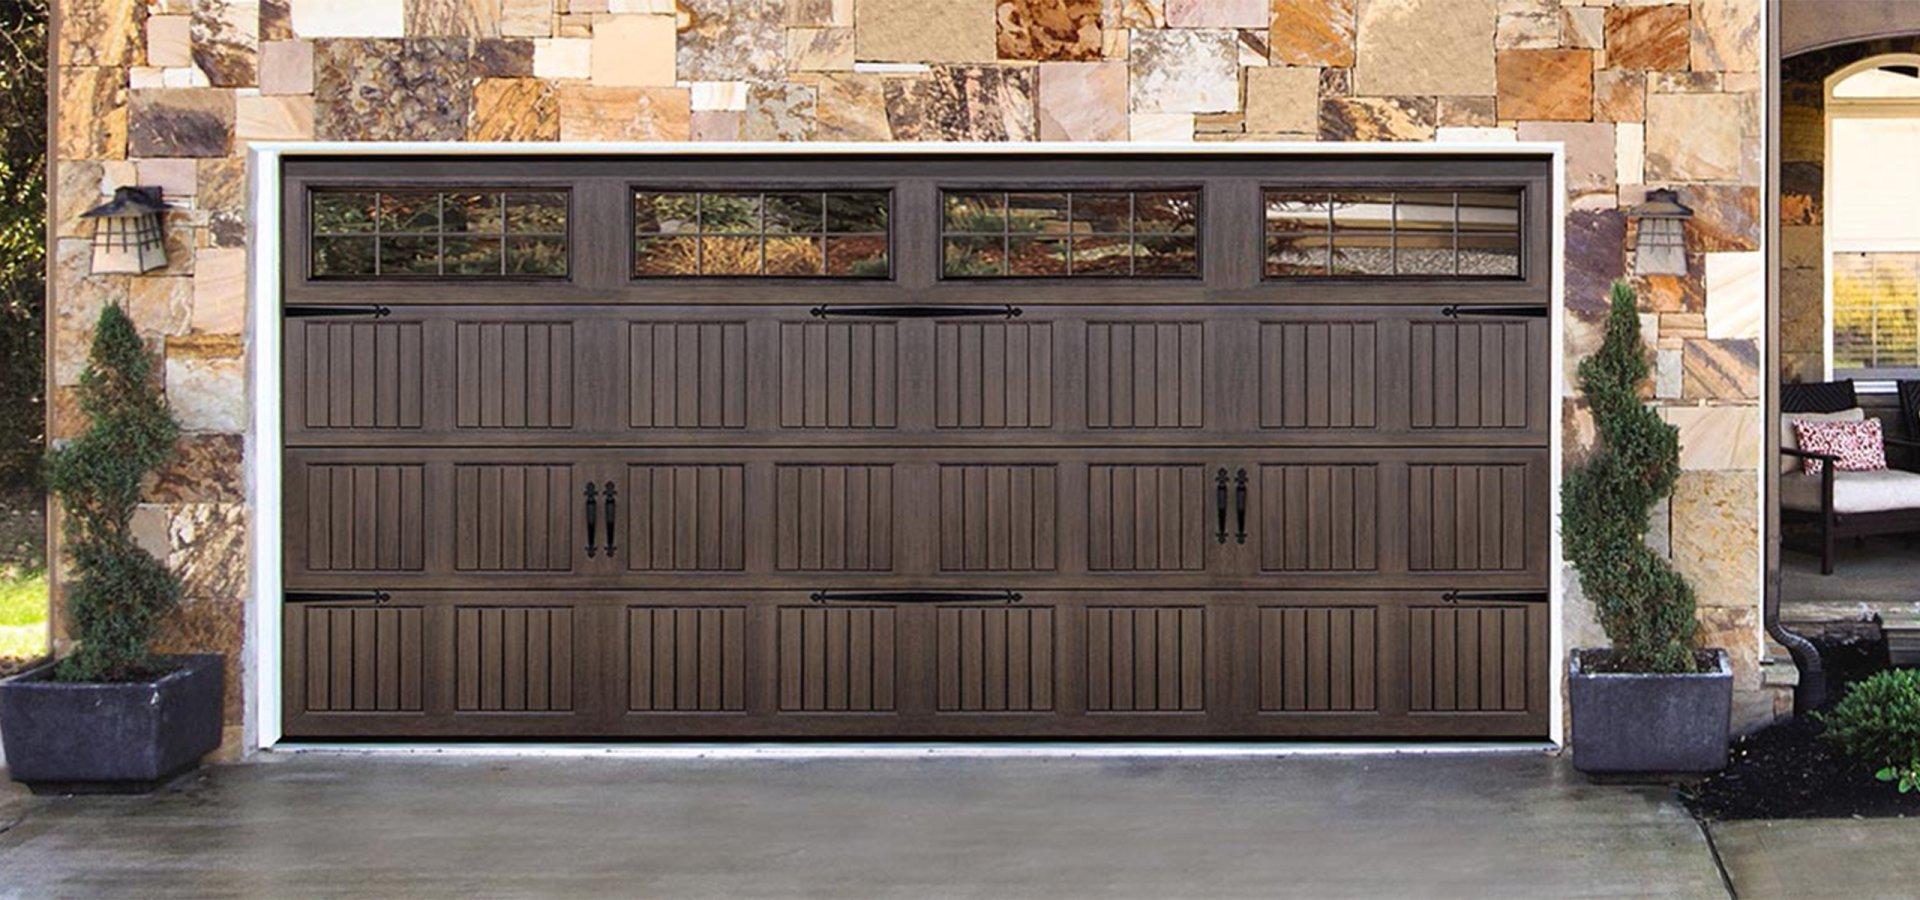 See Me Overhead Garage Doors Simi Valley Ca